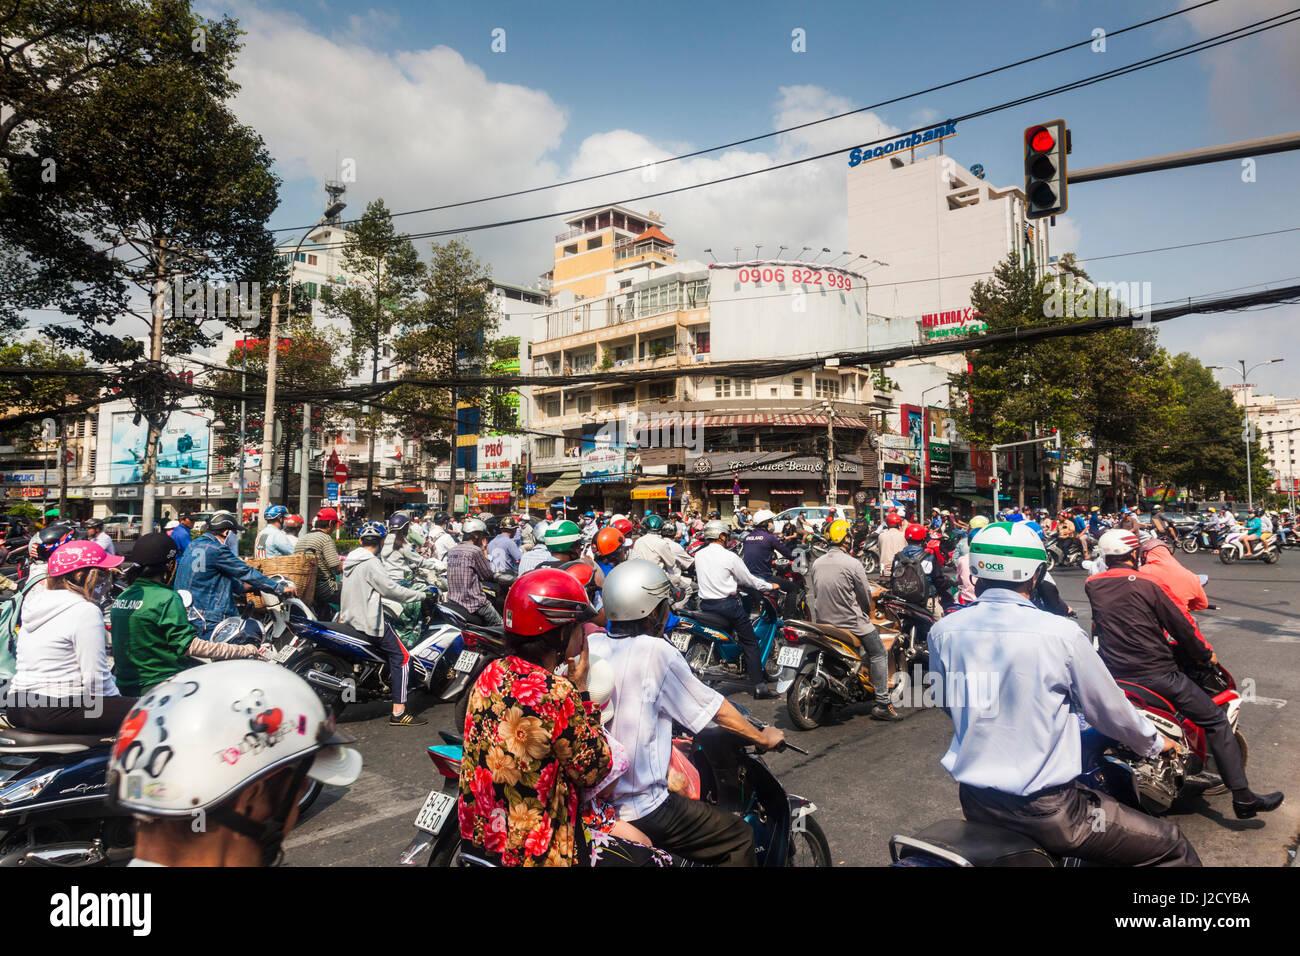 Vietnam, Ho Chi Minh City. Motorbike traffic - Stock Image